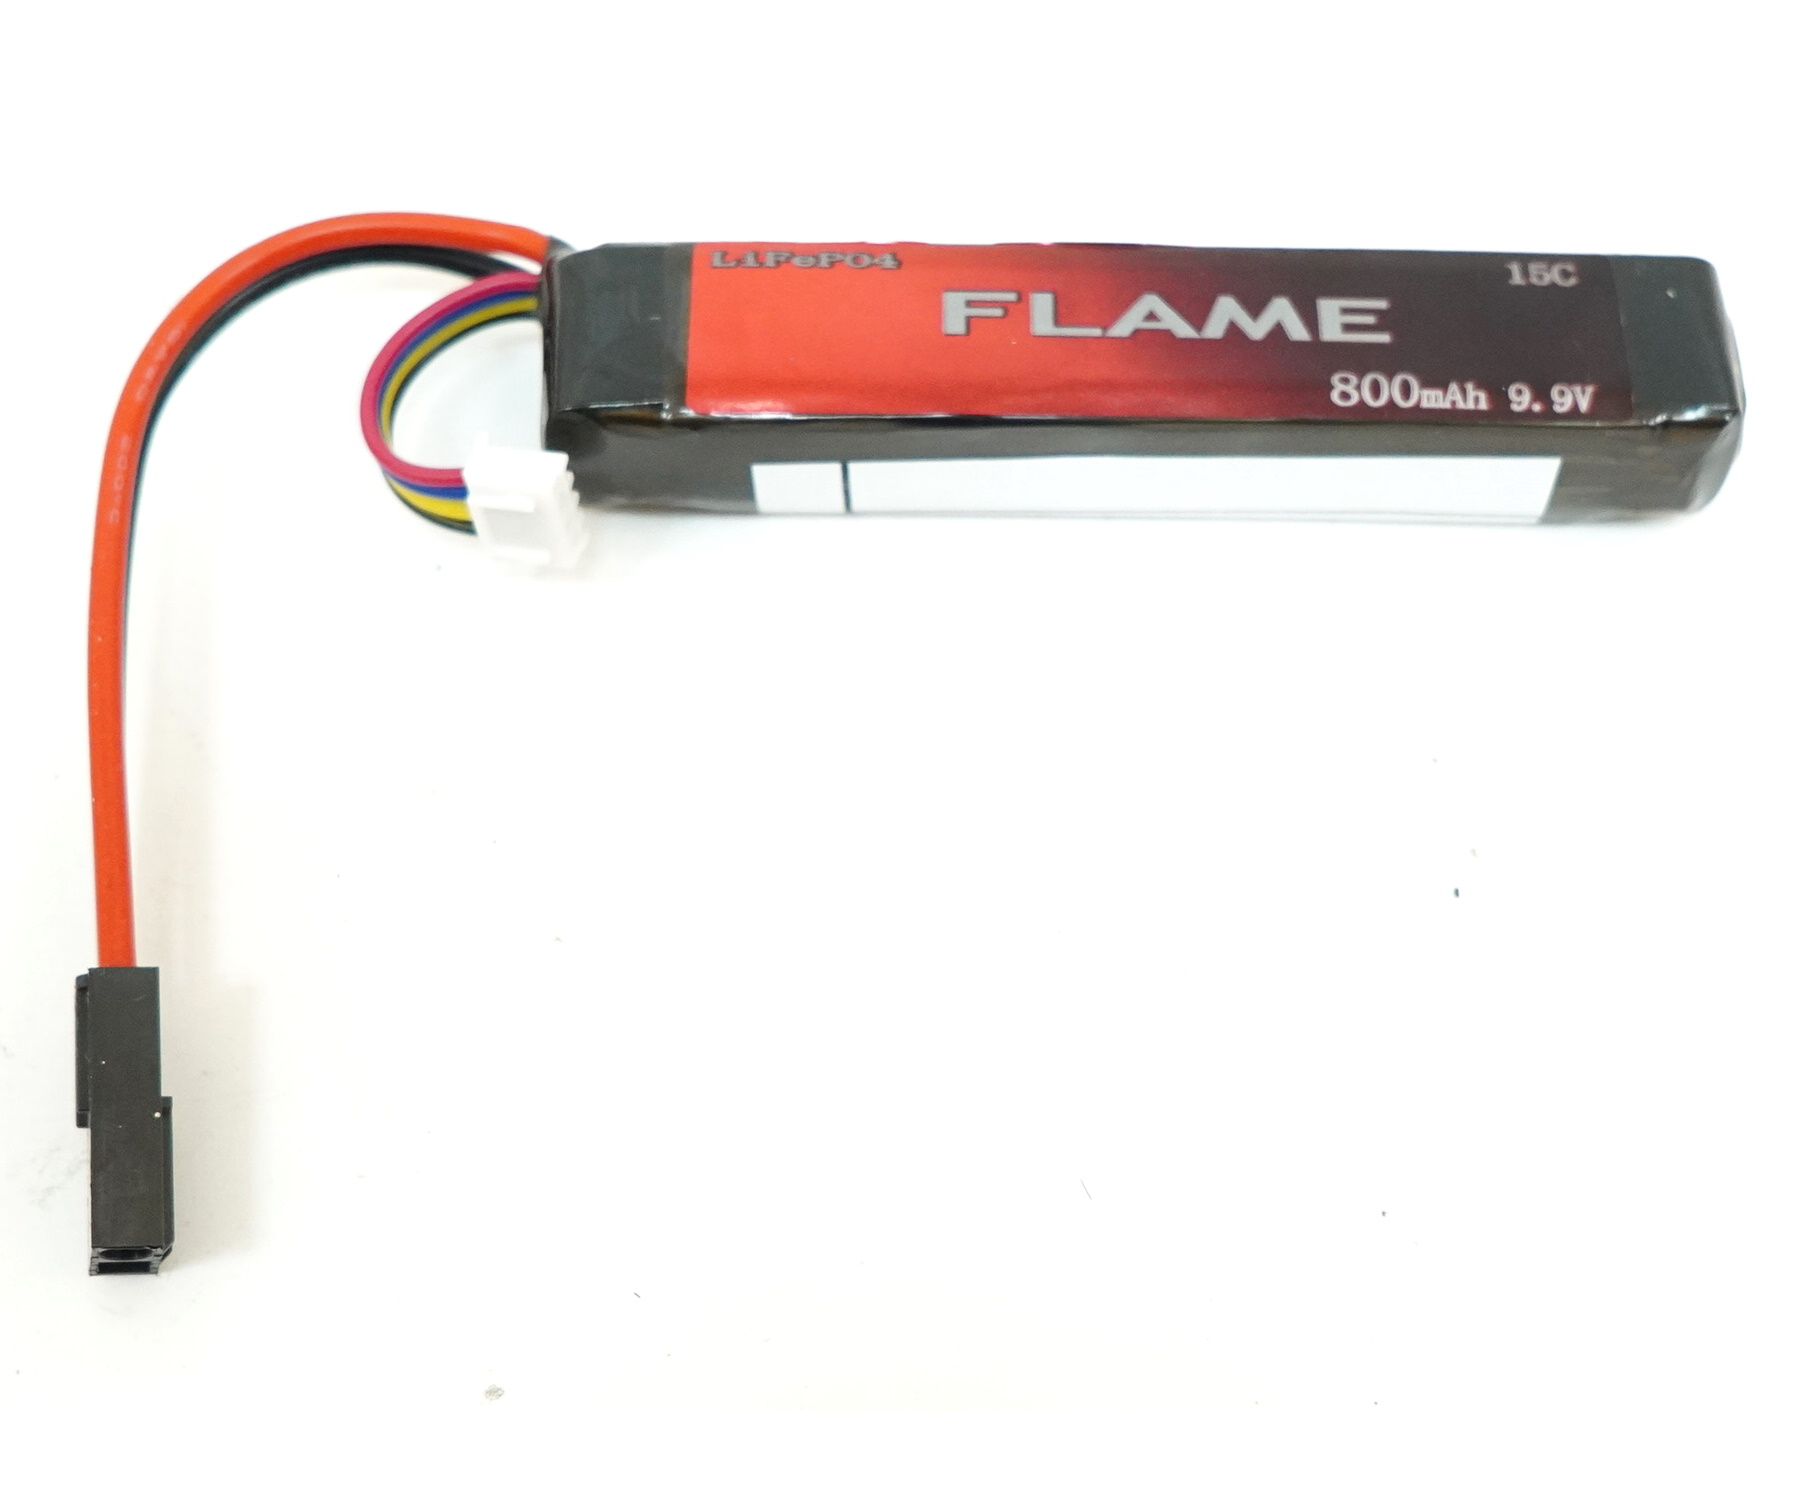 Аккумулятор Flame LiFePO4 9.9V 800mah 15C M3E08, 100x21x18 мм